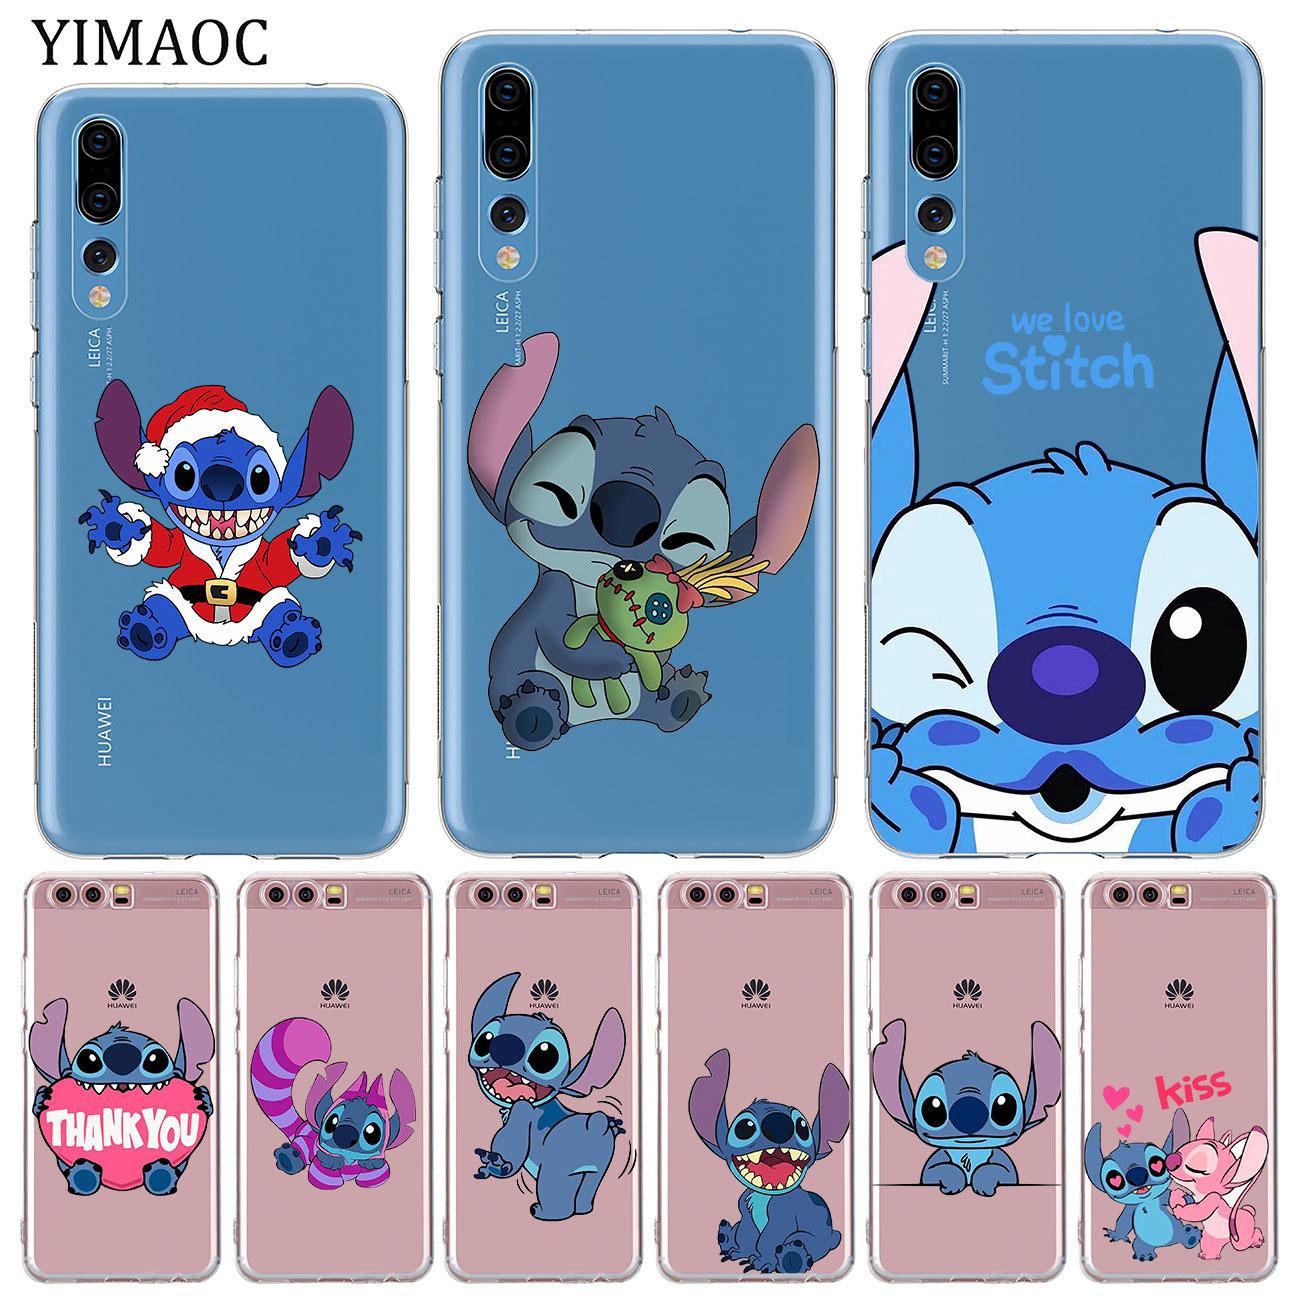 YIMAOC לילו וסטיץ 'רך סיליקון tpu טלפון Case עבור Huawei P30 P20 פרו P10 P8 P9 לייט 2017 2016 2015 P חכם Z 2019 כיסוי